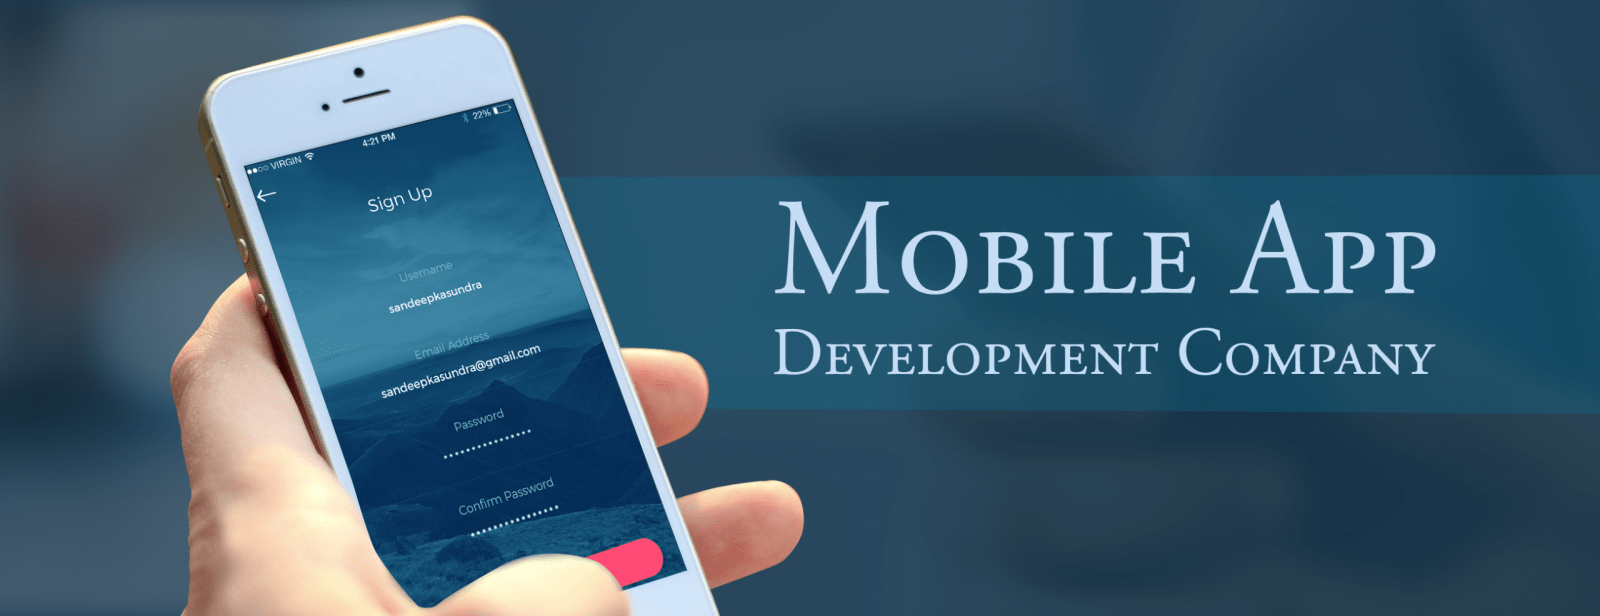 App Development Company in Kenya